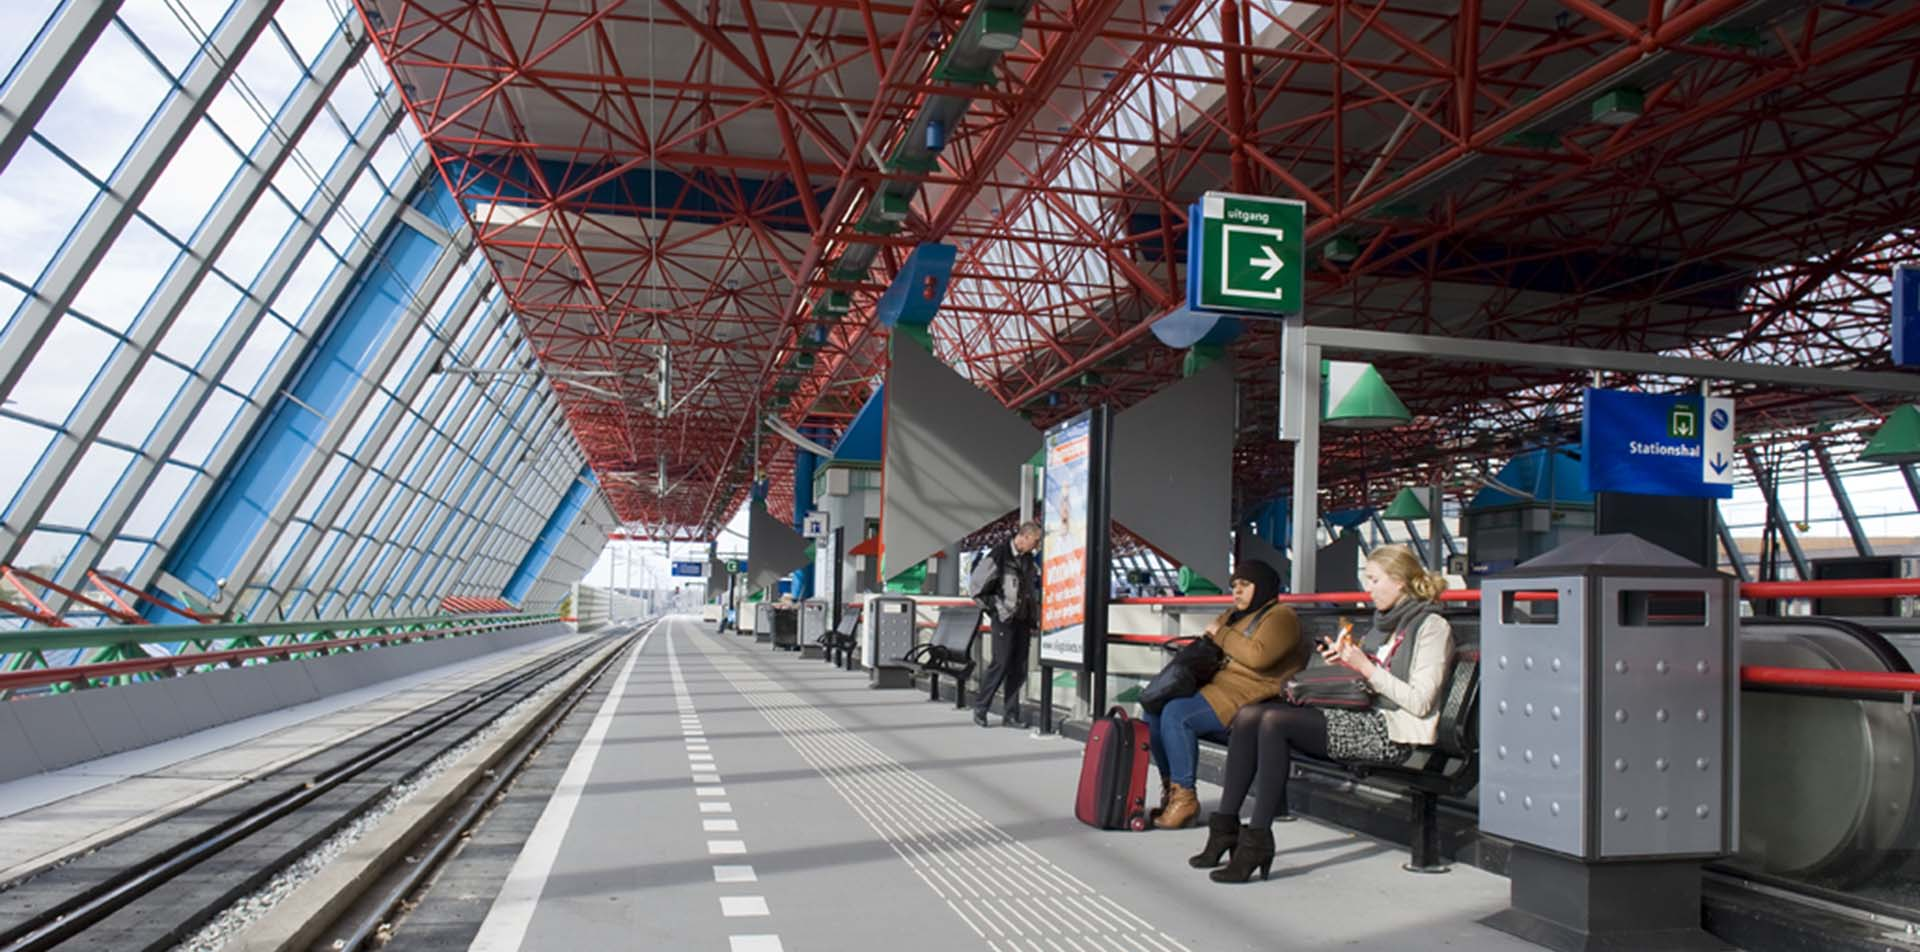 station Lelystad Centrum